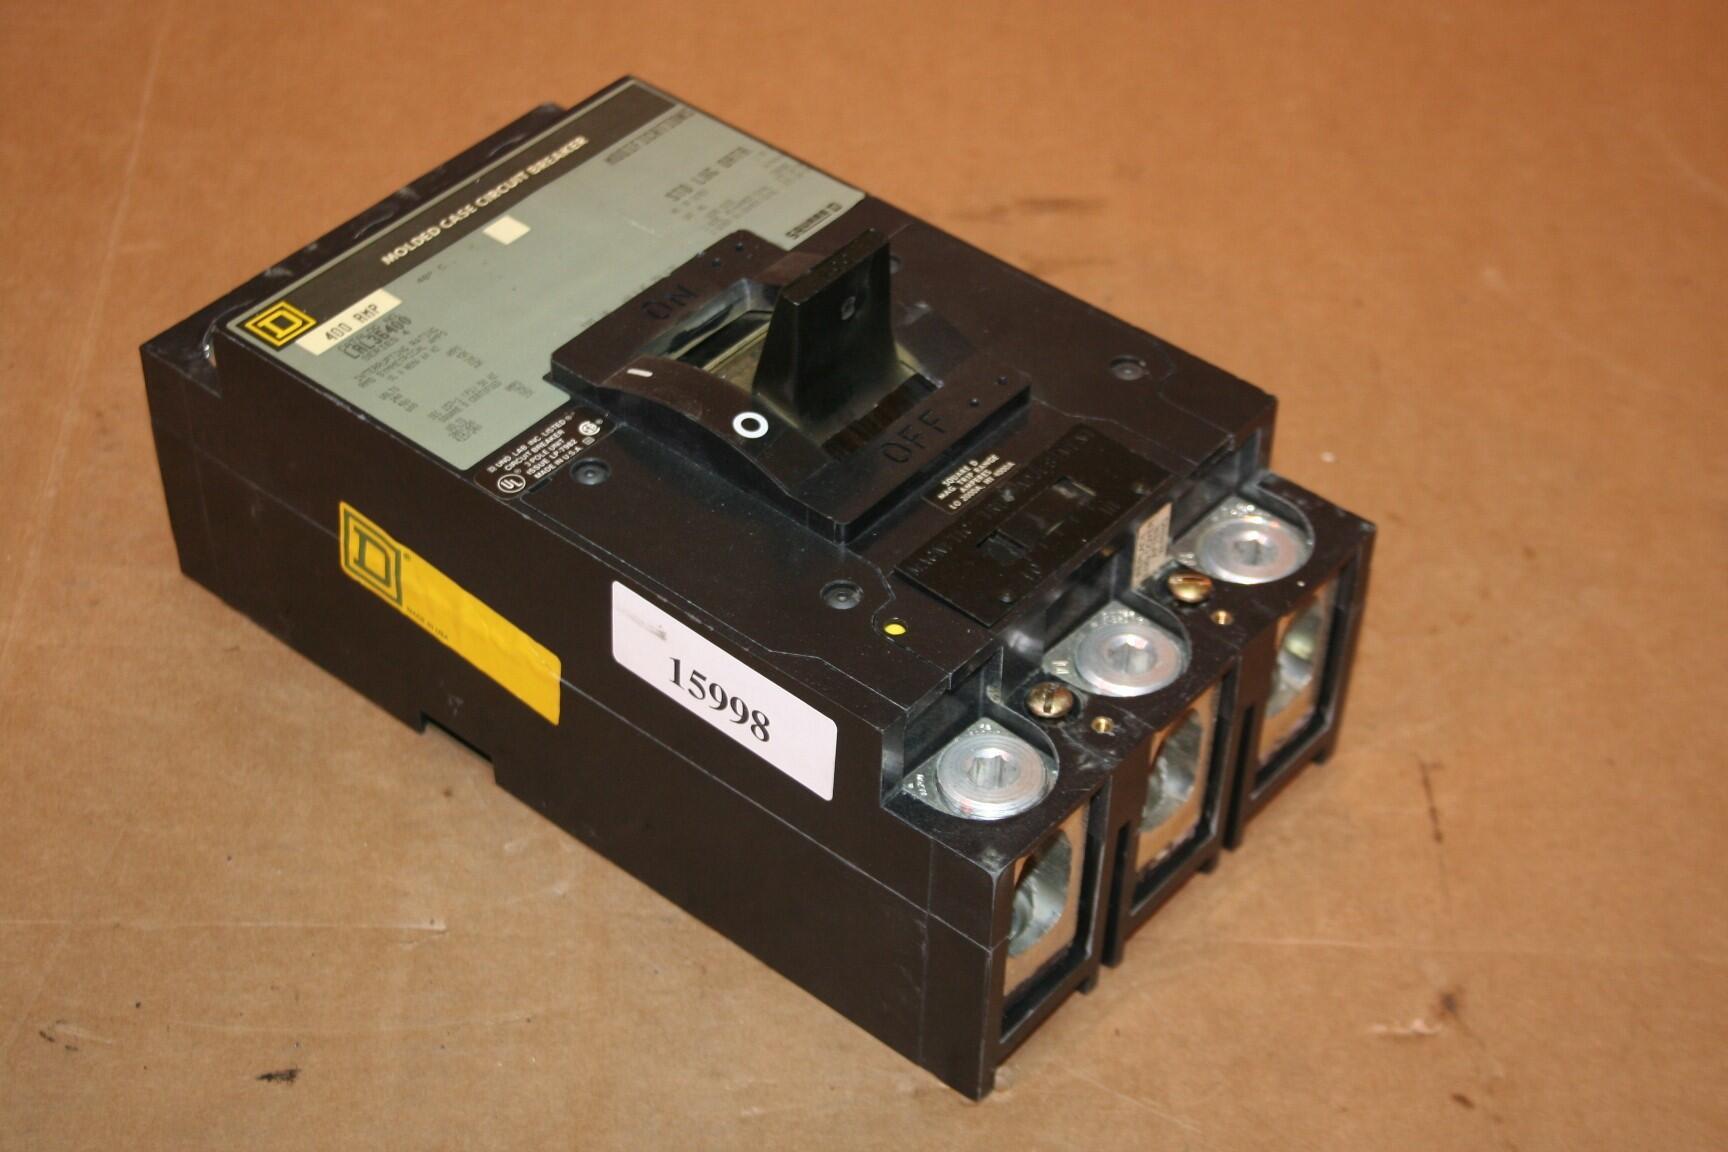 Square D 400 Amp Circuit Breaker LAL36400 Used #15998 eBay #BA9011